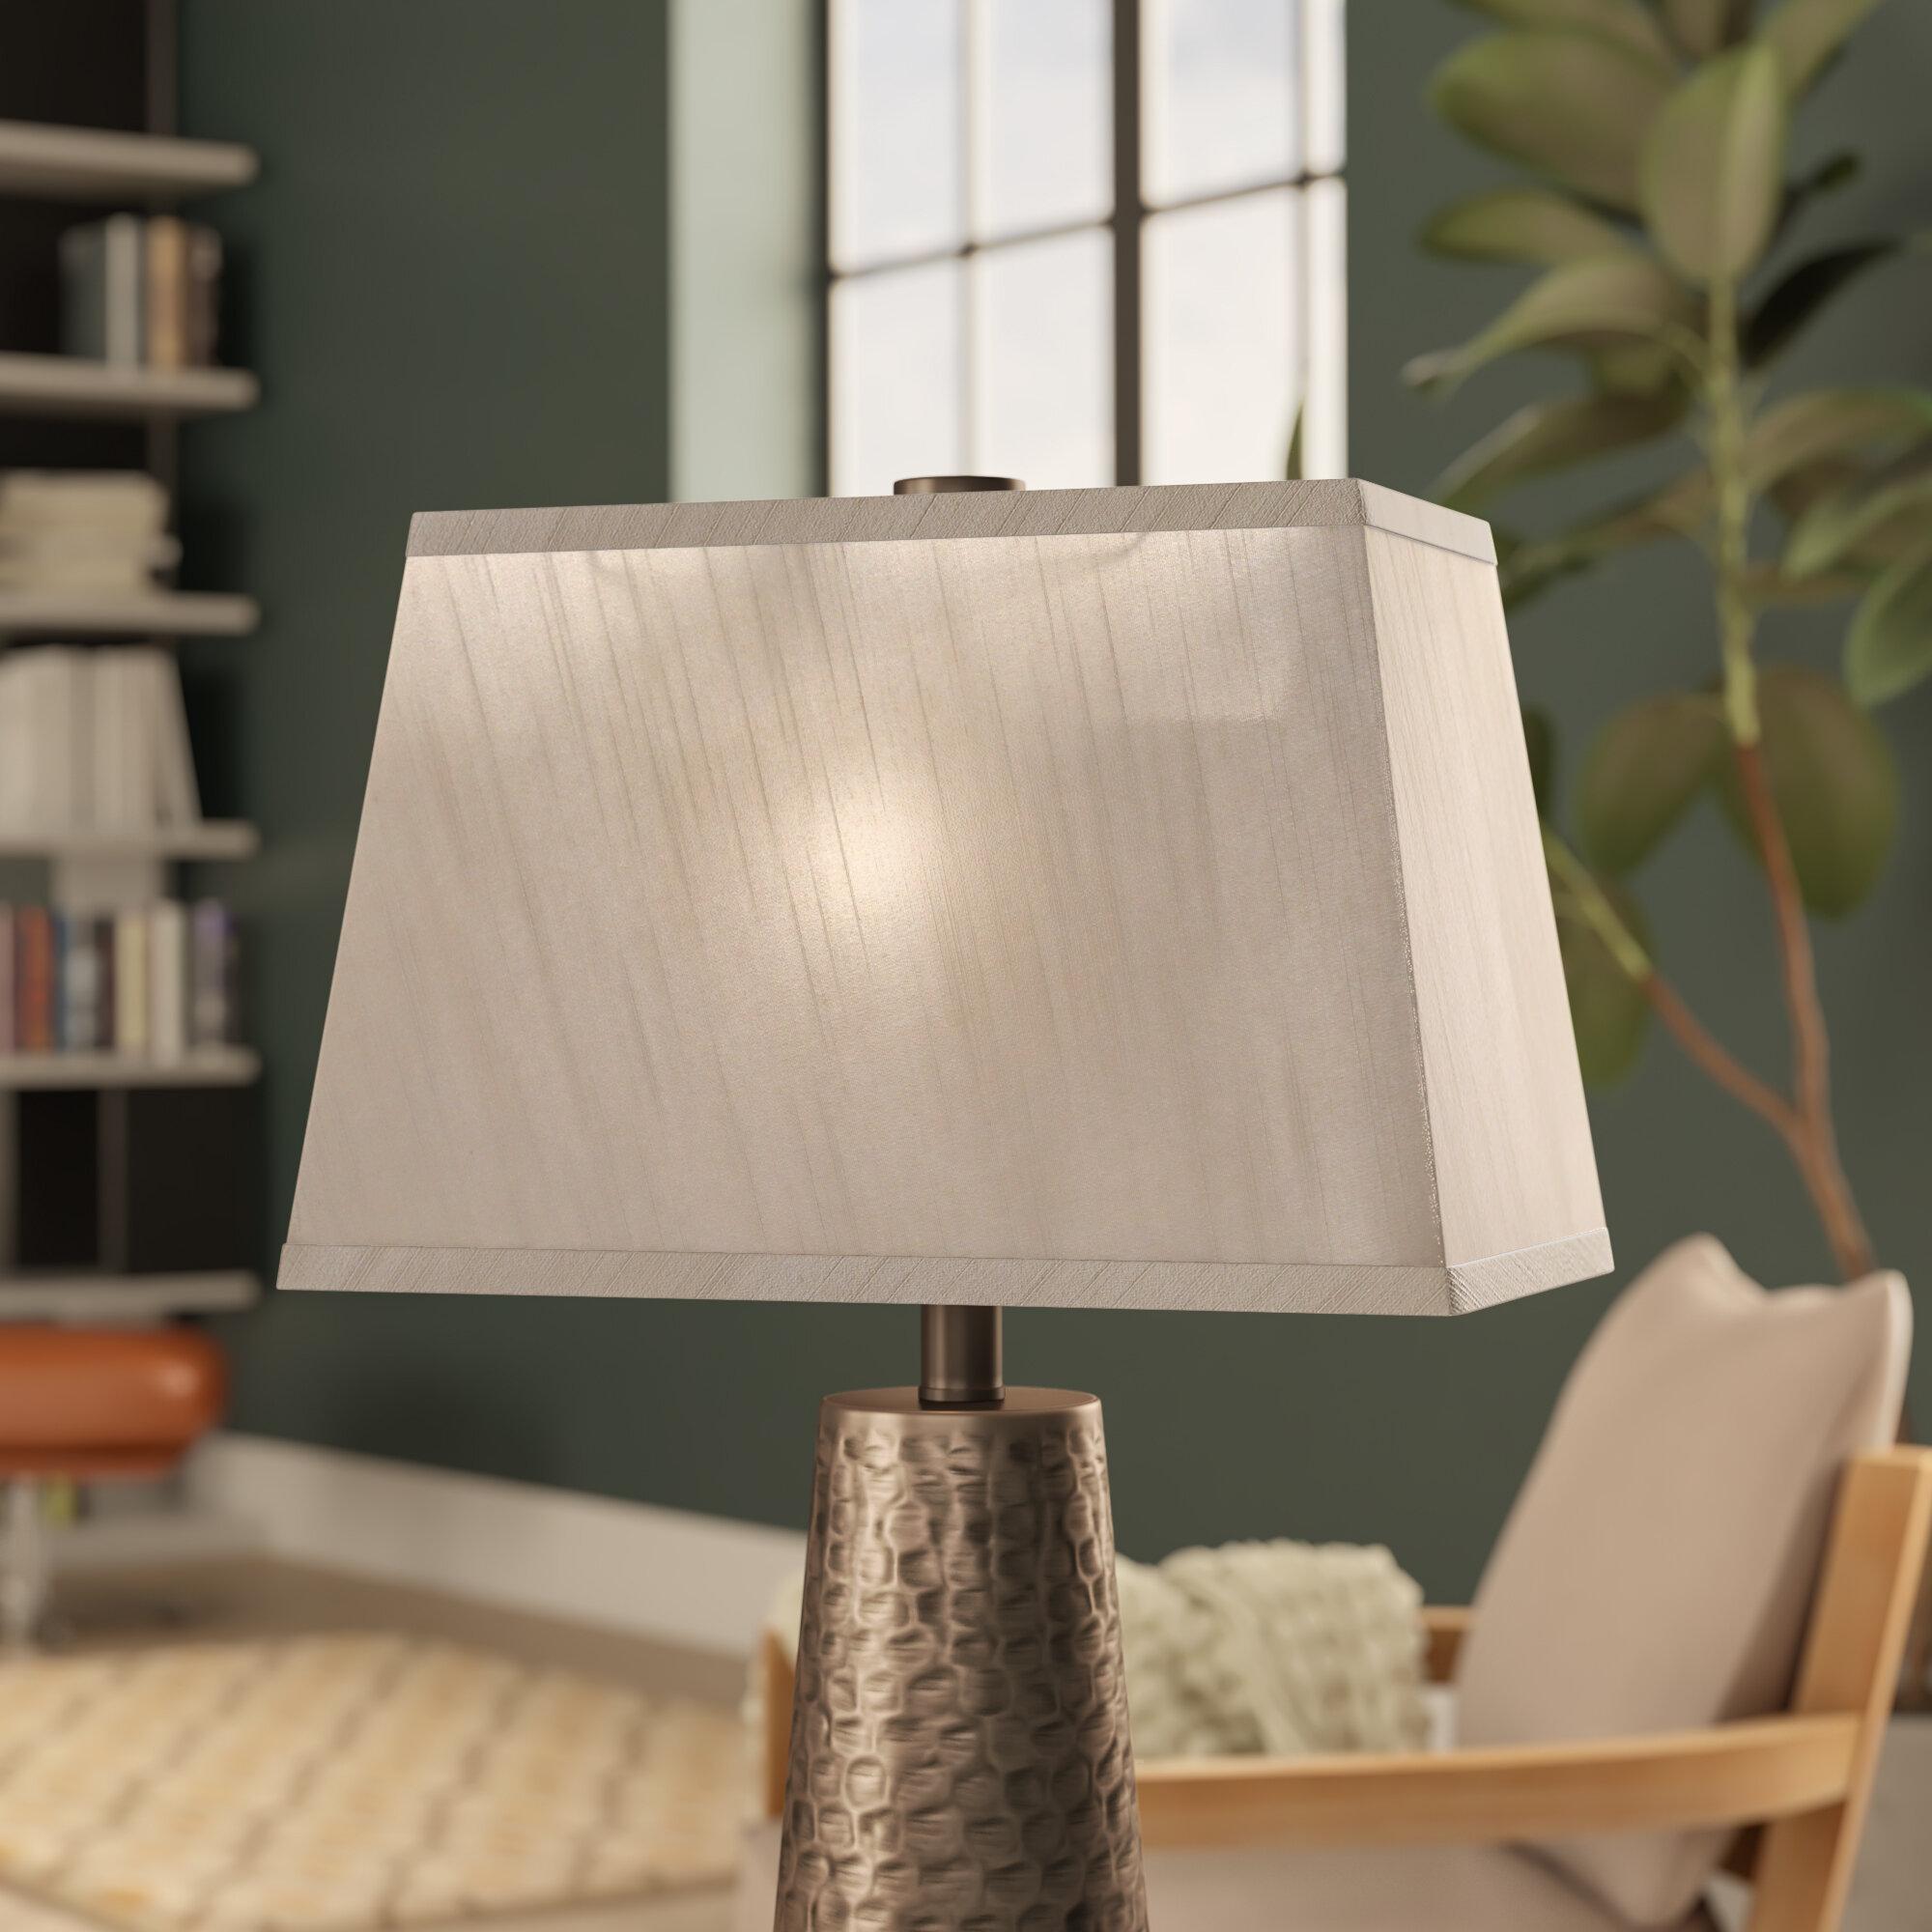 Brayden studio 14 fabric rectangular lamp shade reviews wayfair aloadofball Choice Image